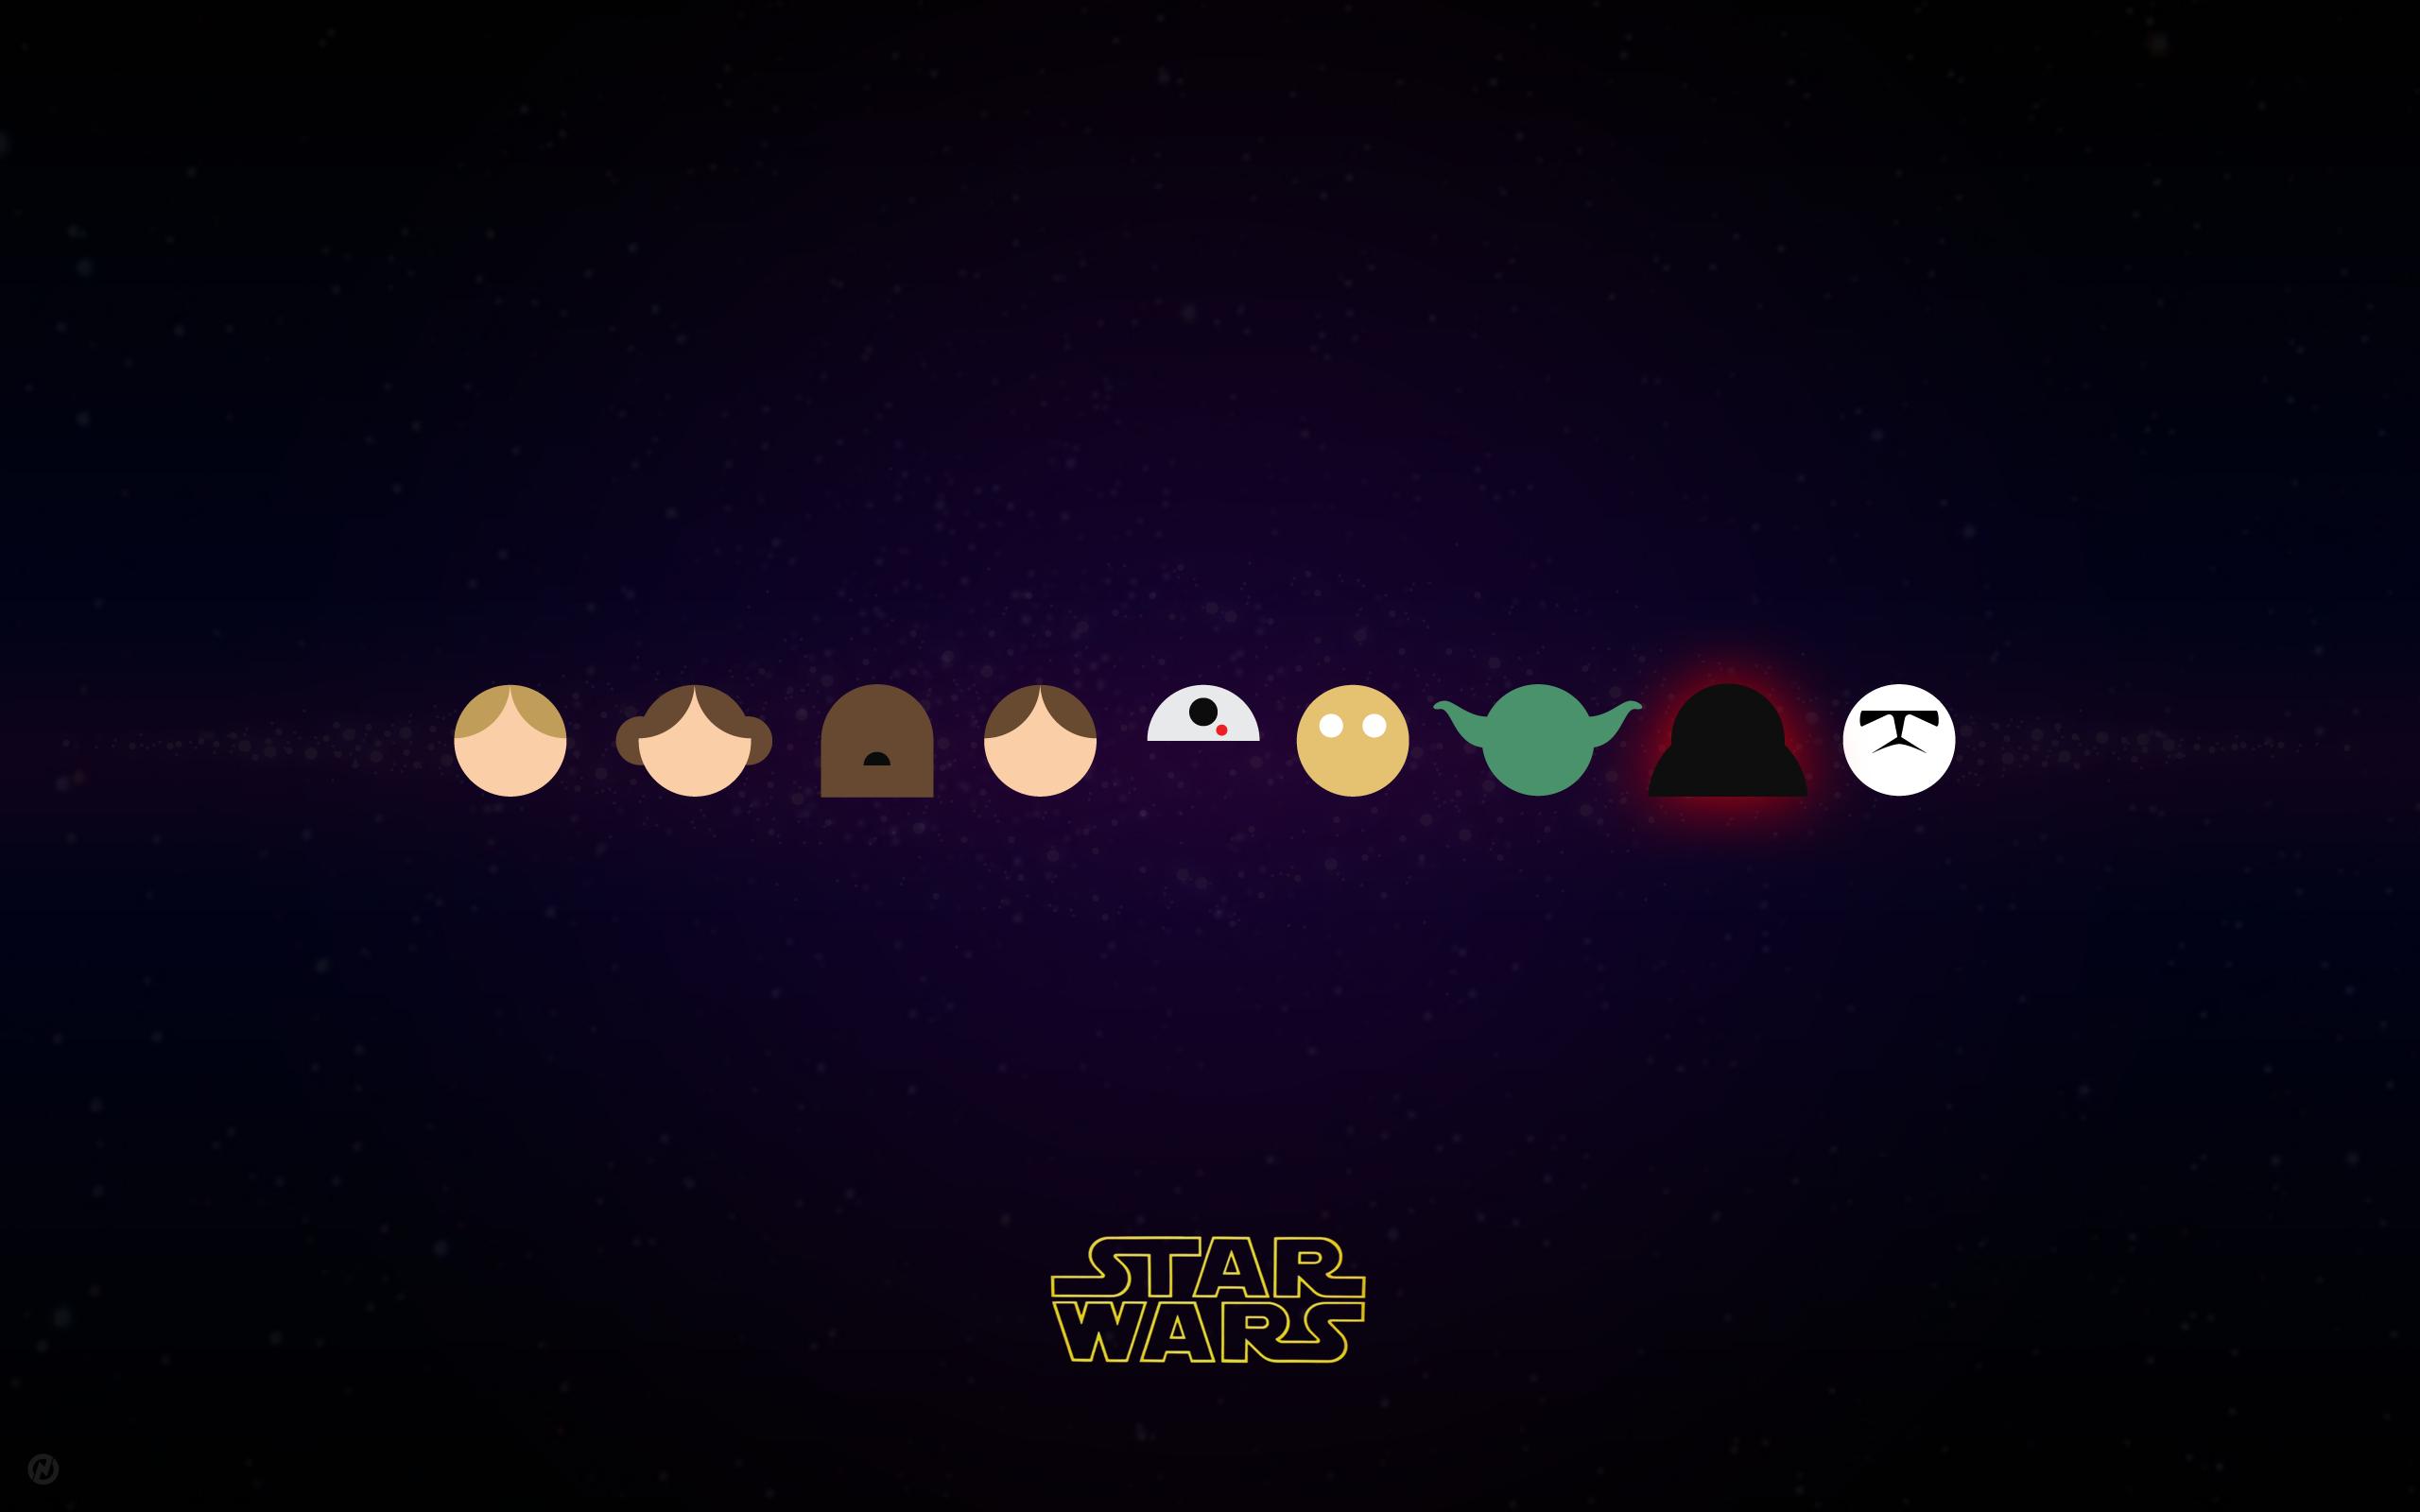 General 2560x1600 Star Wars minimalism Yoda Han Solo Princess Leia R2-D2 Luke Skywalker Chewbacca C-3PO Darth Vader stormtrooper